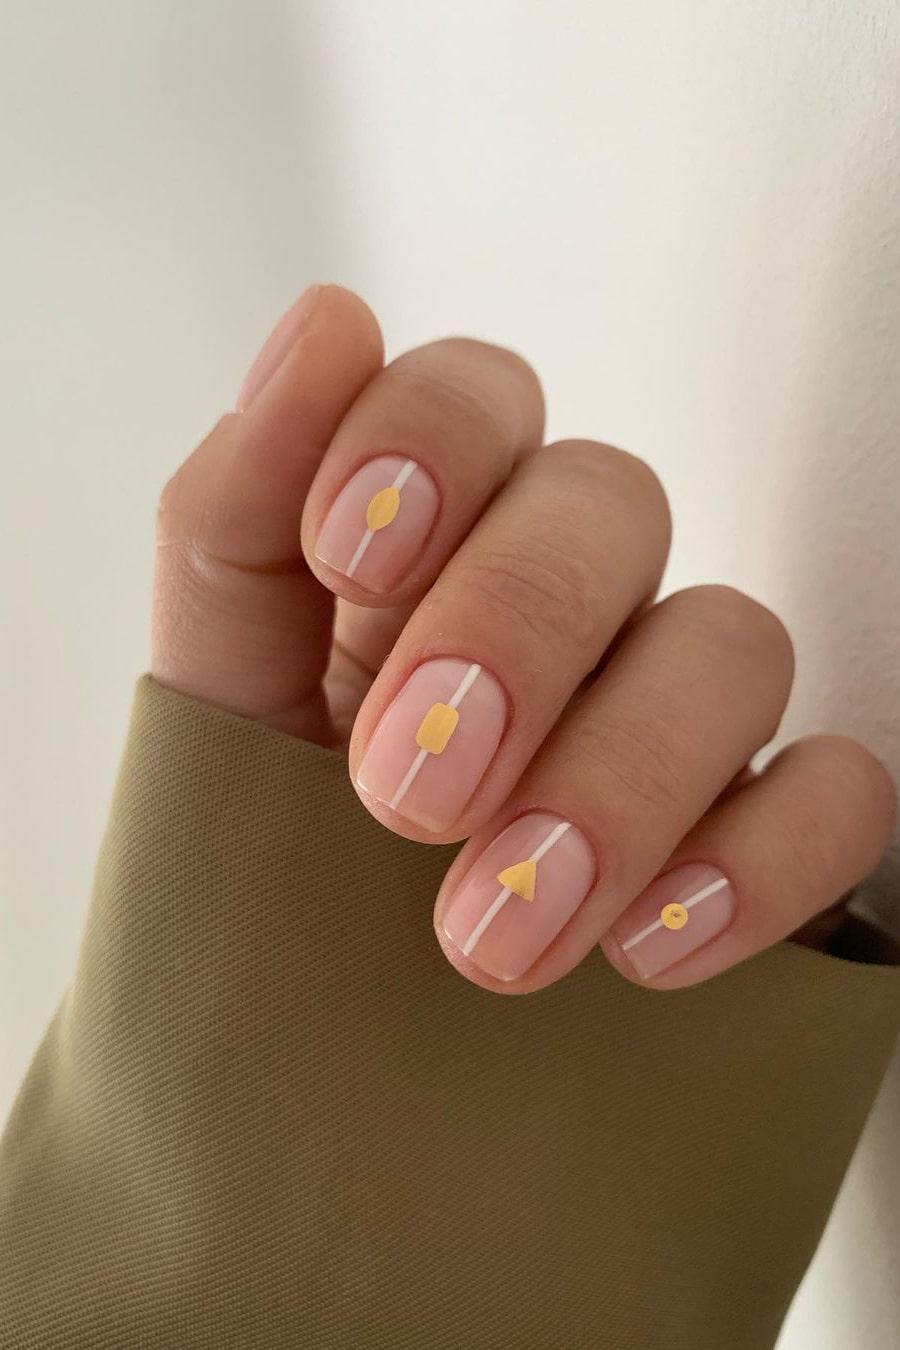 Simple geometric negative space nails